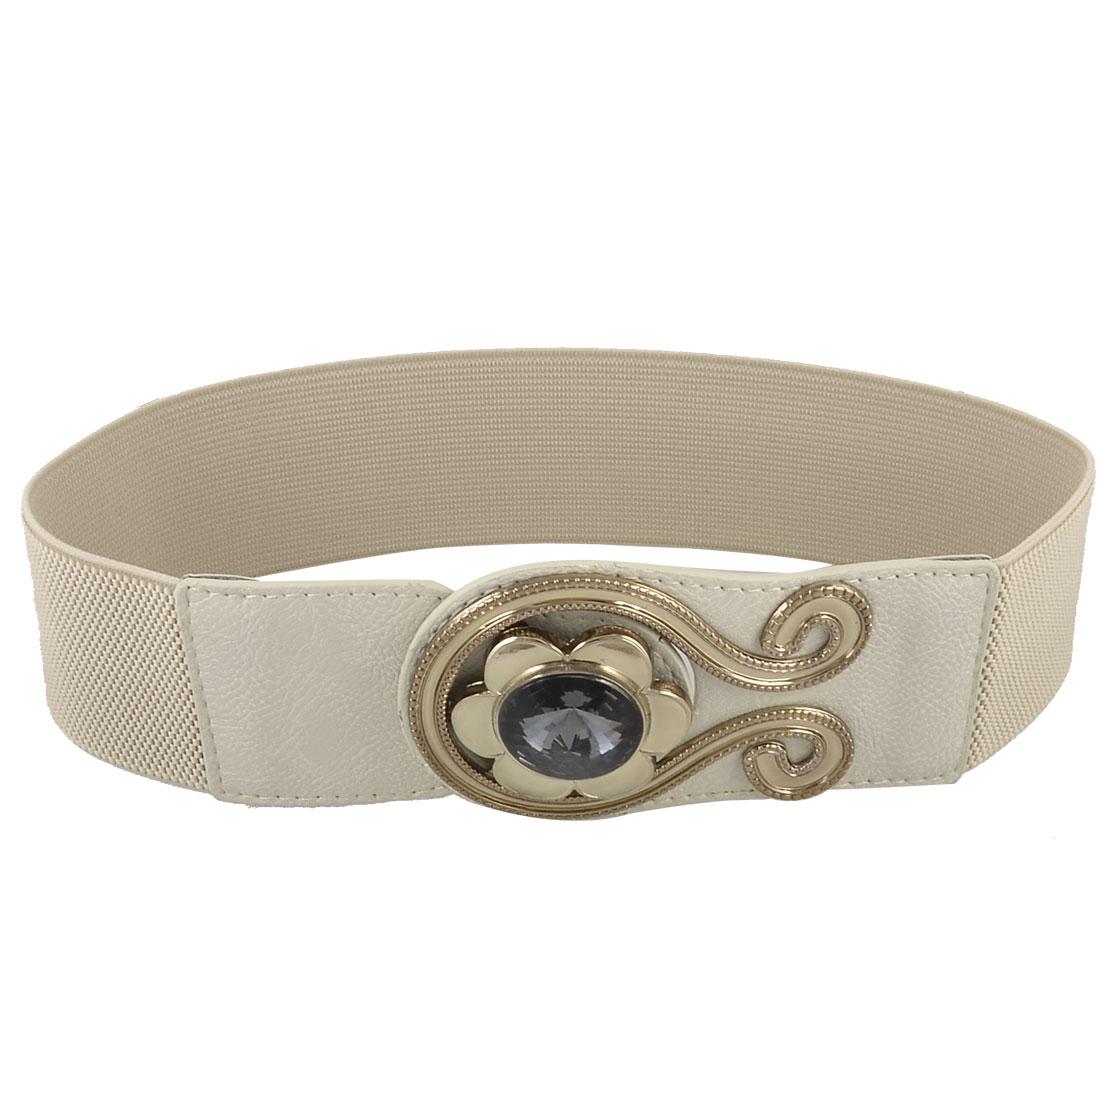 Women Crystal Flower Metal Interlock Buckle 6cm Wide Stretchy Cinch Belt Khaki